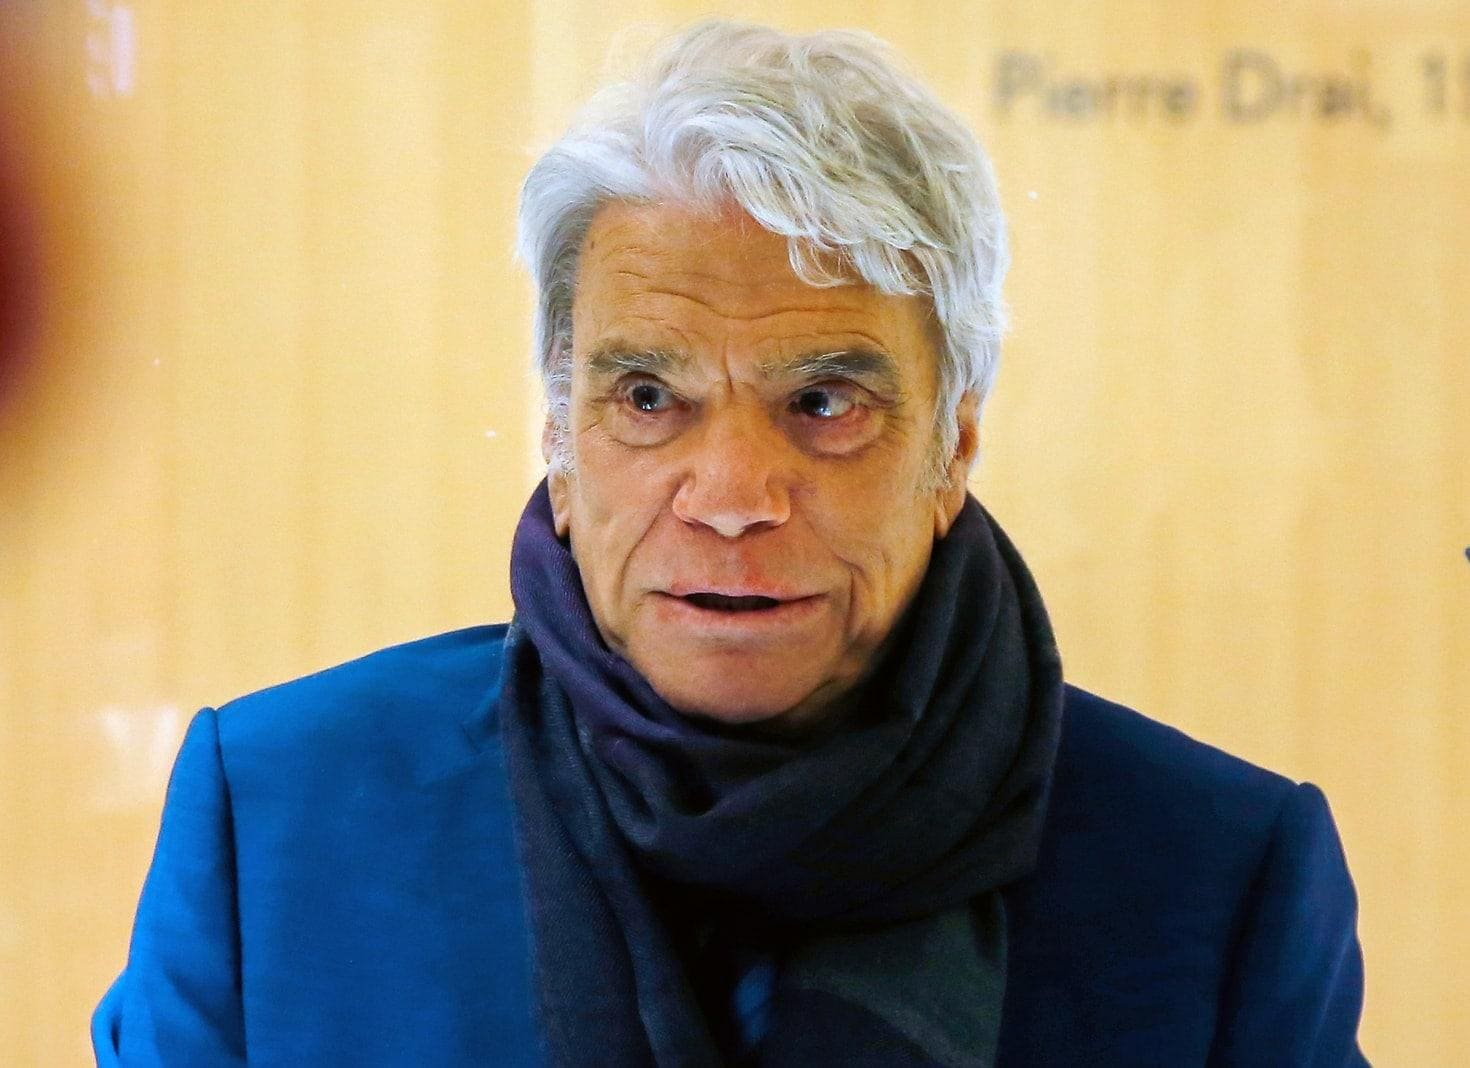 Bernard Tapie 2019